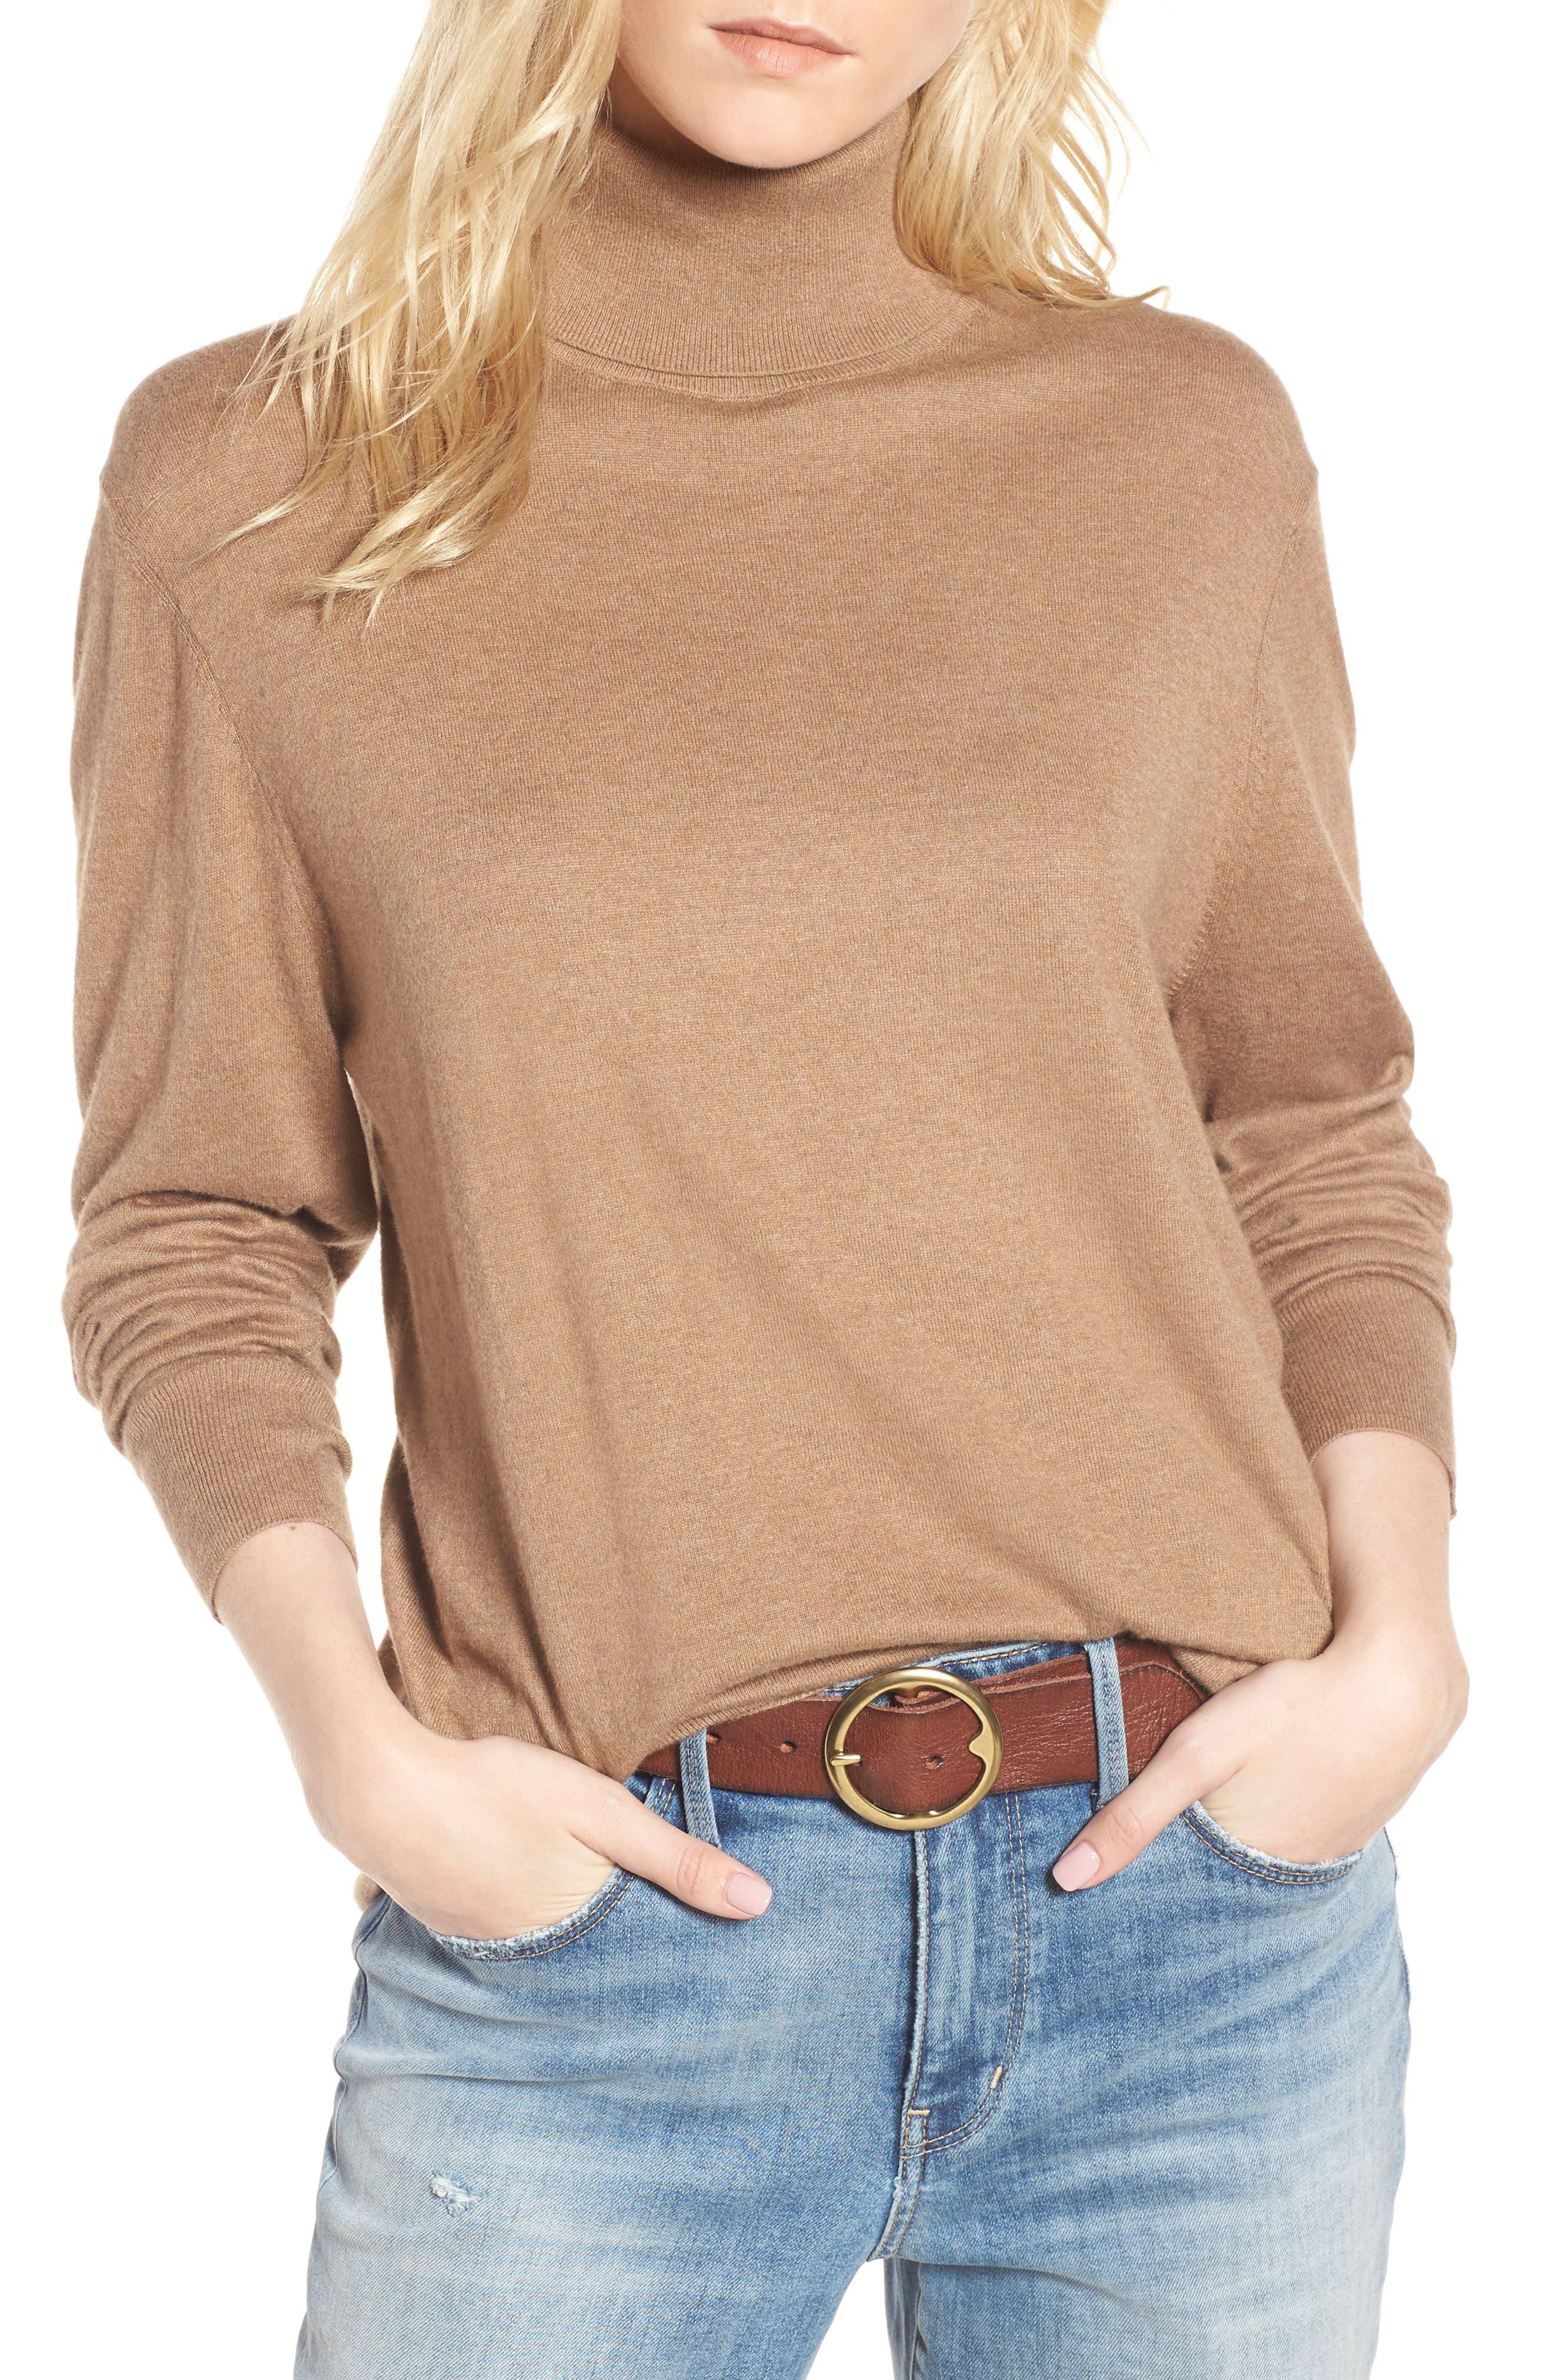 Treasure & Bond Boyfriend Turtleneck Sweater